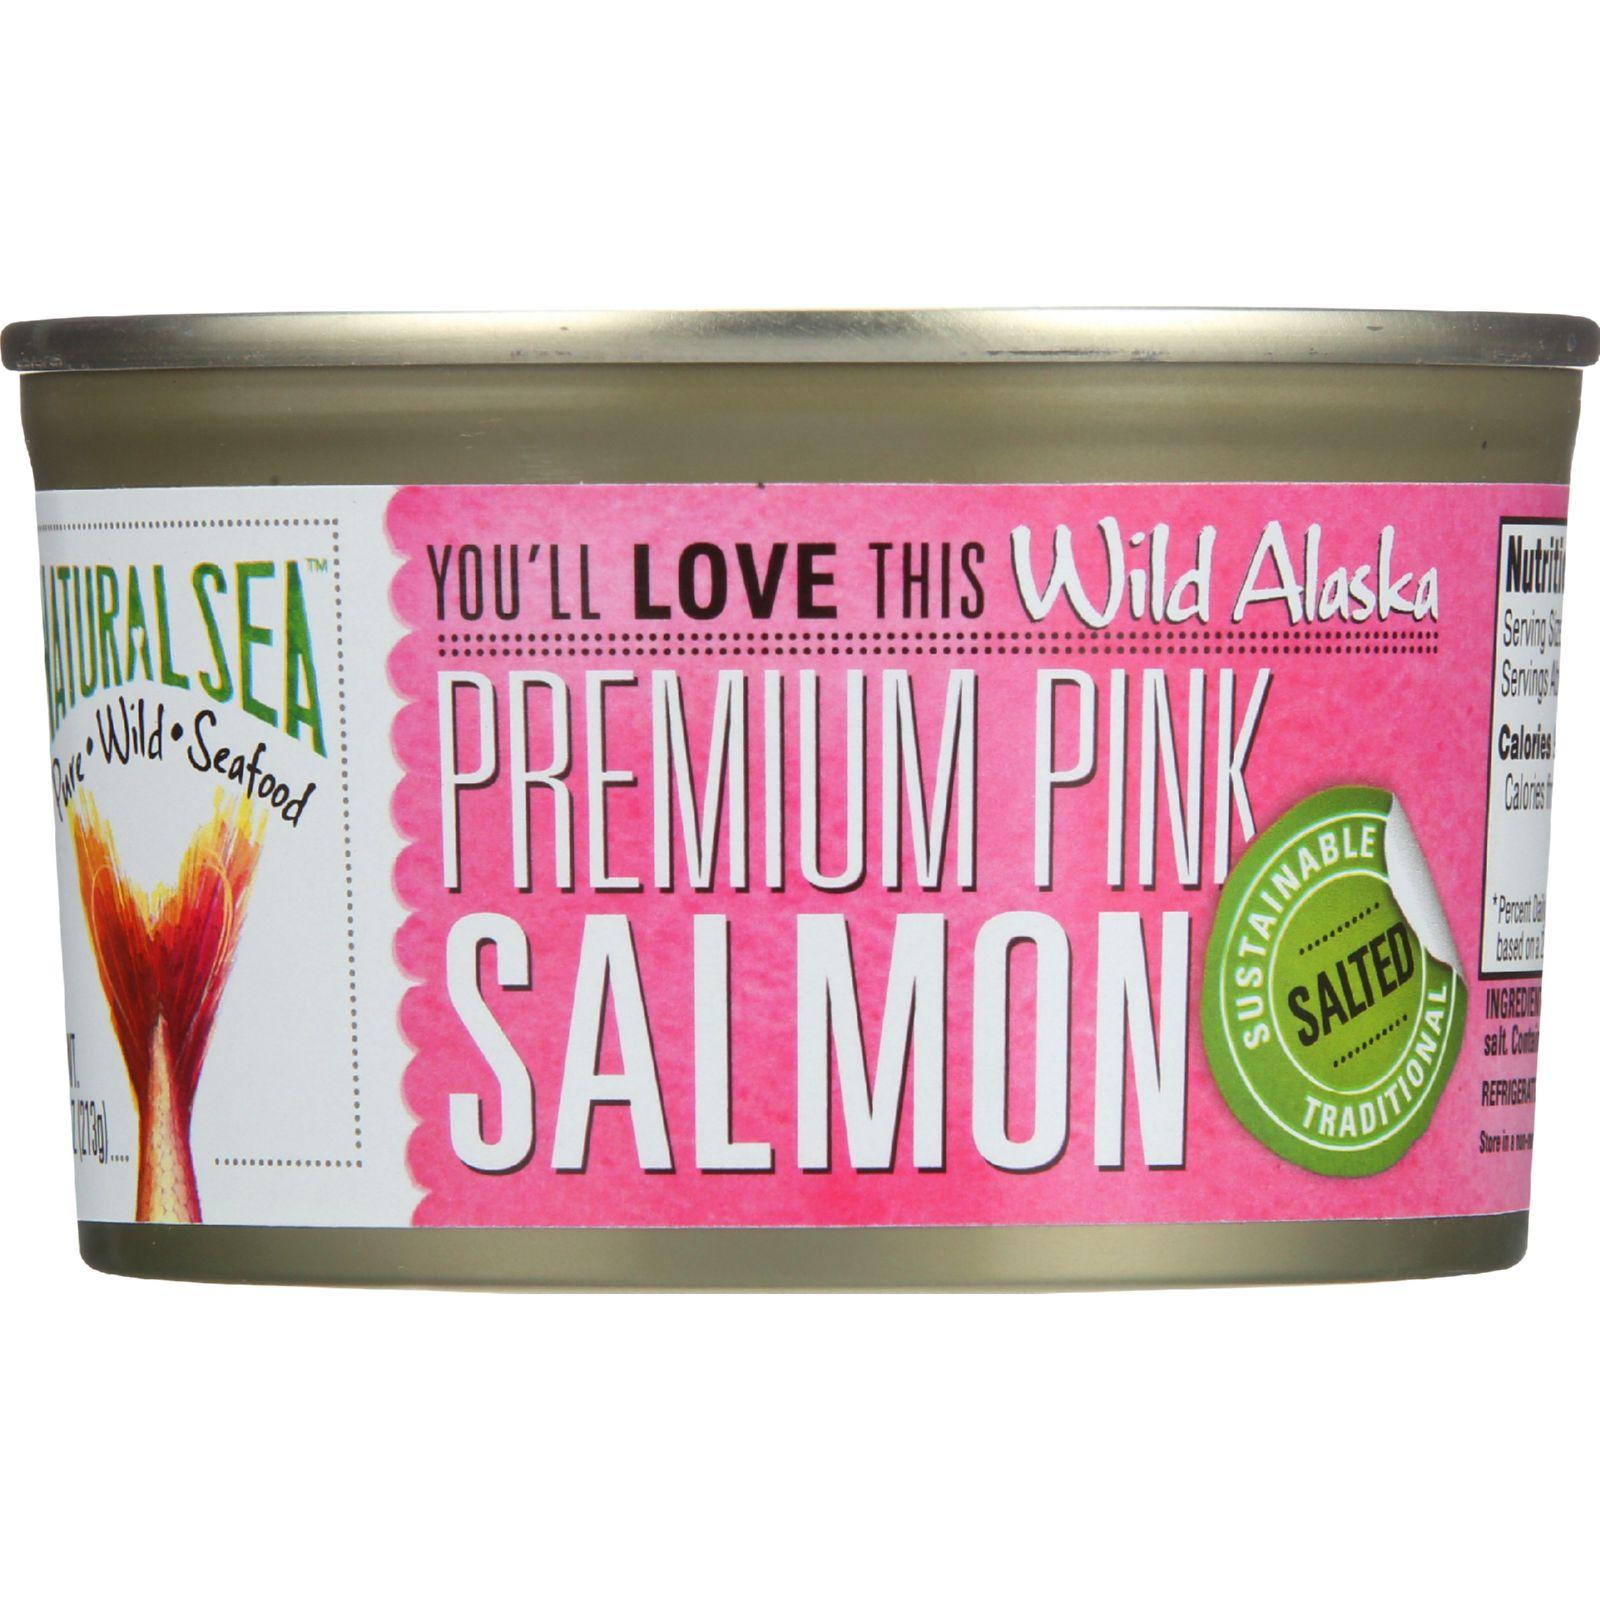 Natural Sea Salmon Premium Pink Wild Alaska Salted 7.5 oz case of 12 by Natural Sea